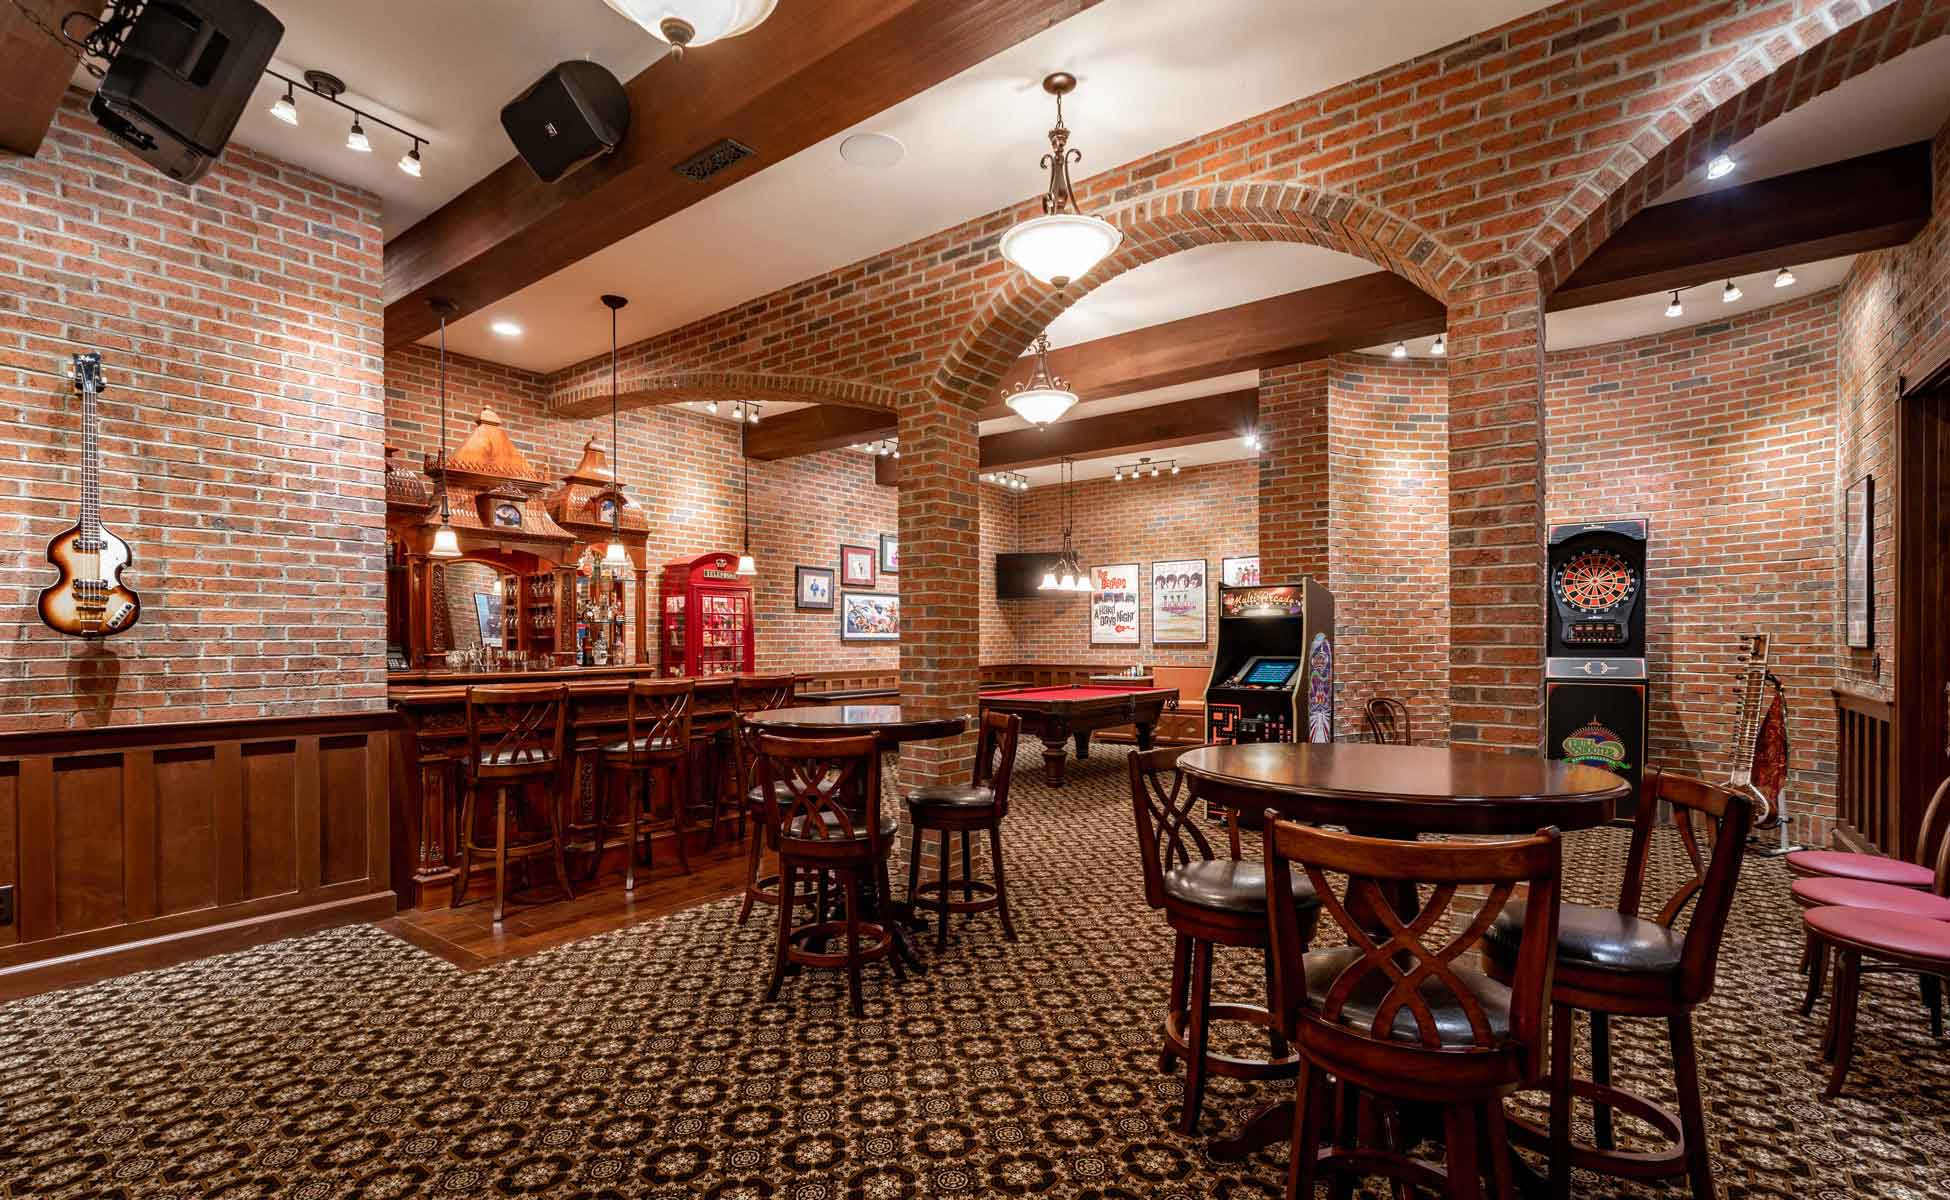 Dream-Vision-Interiors-Pubs-Lounges-Bars-Web-LR